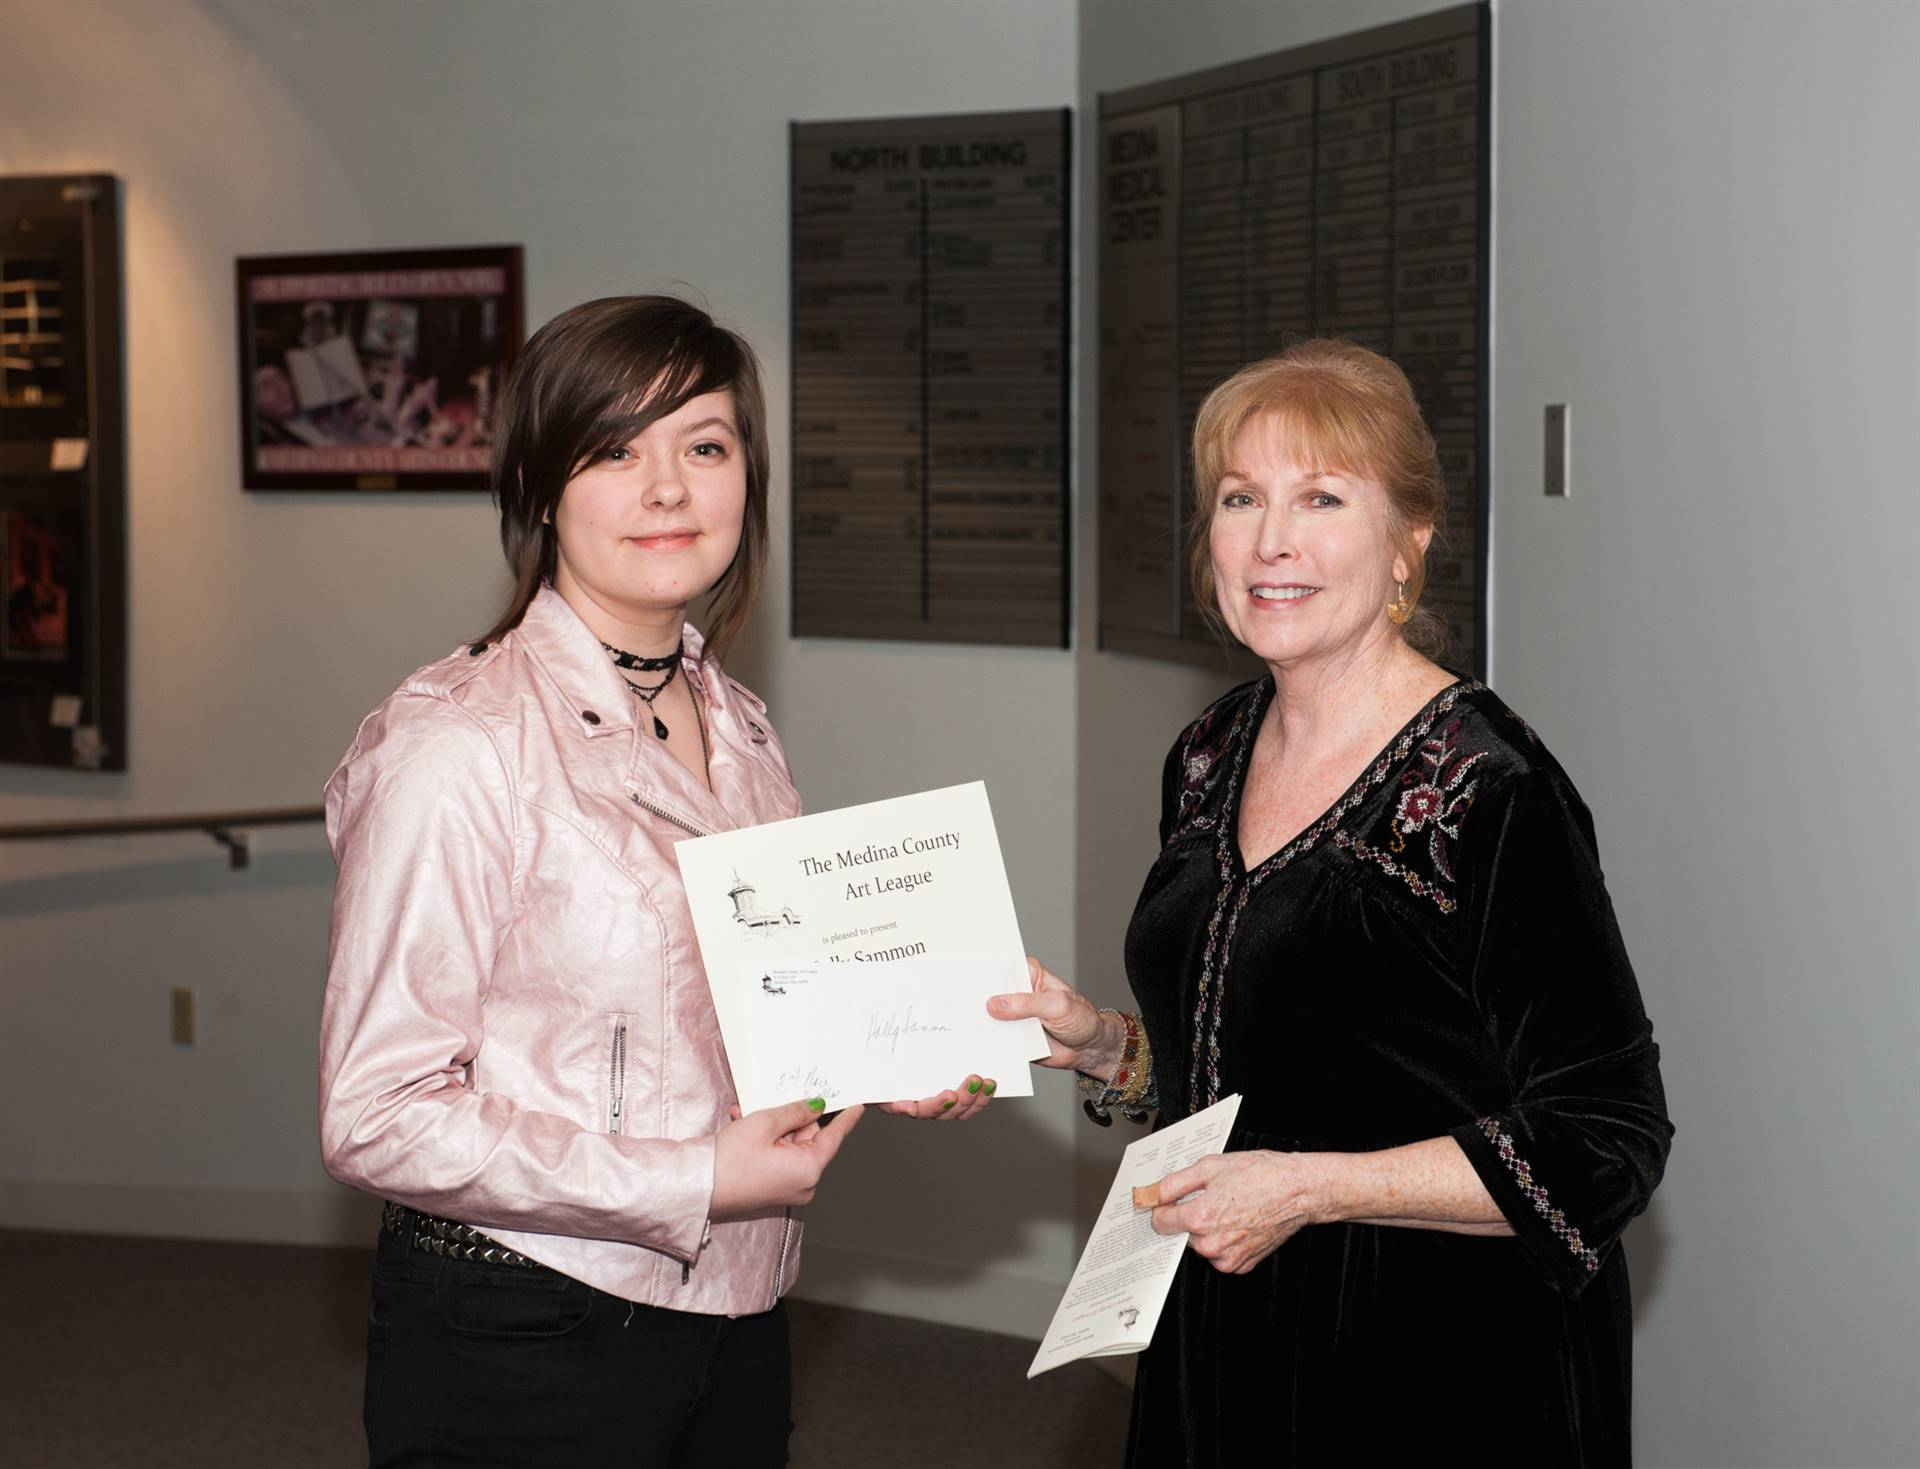 Holly Sammon, Second-Place MCAL Scholarship Winner